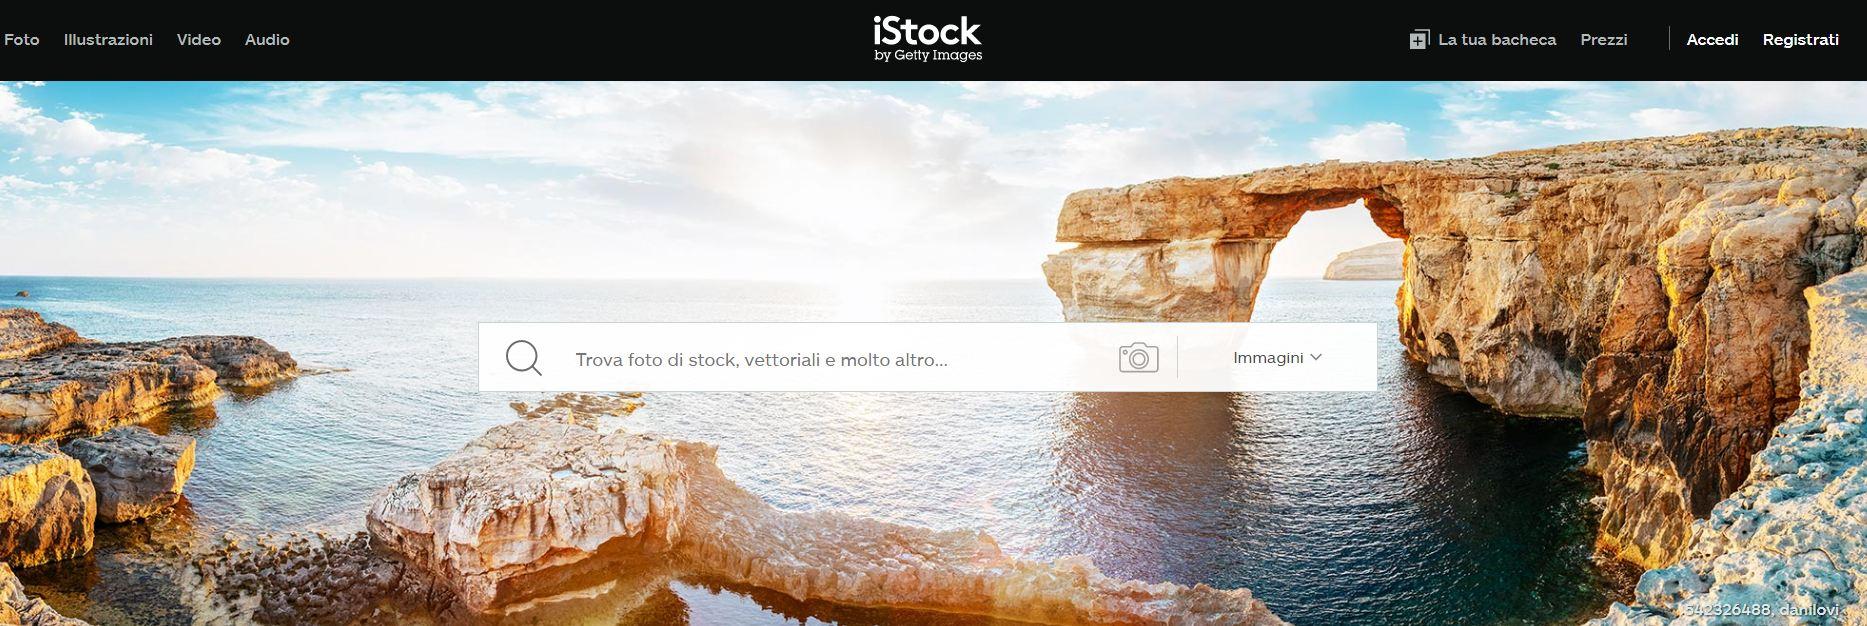 istockphotos best stock photo websites